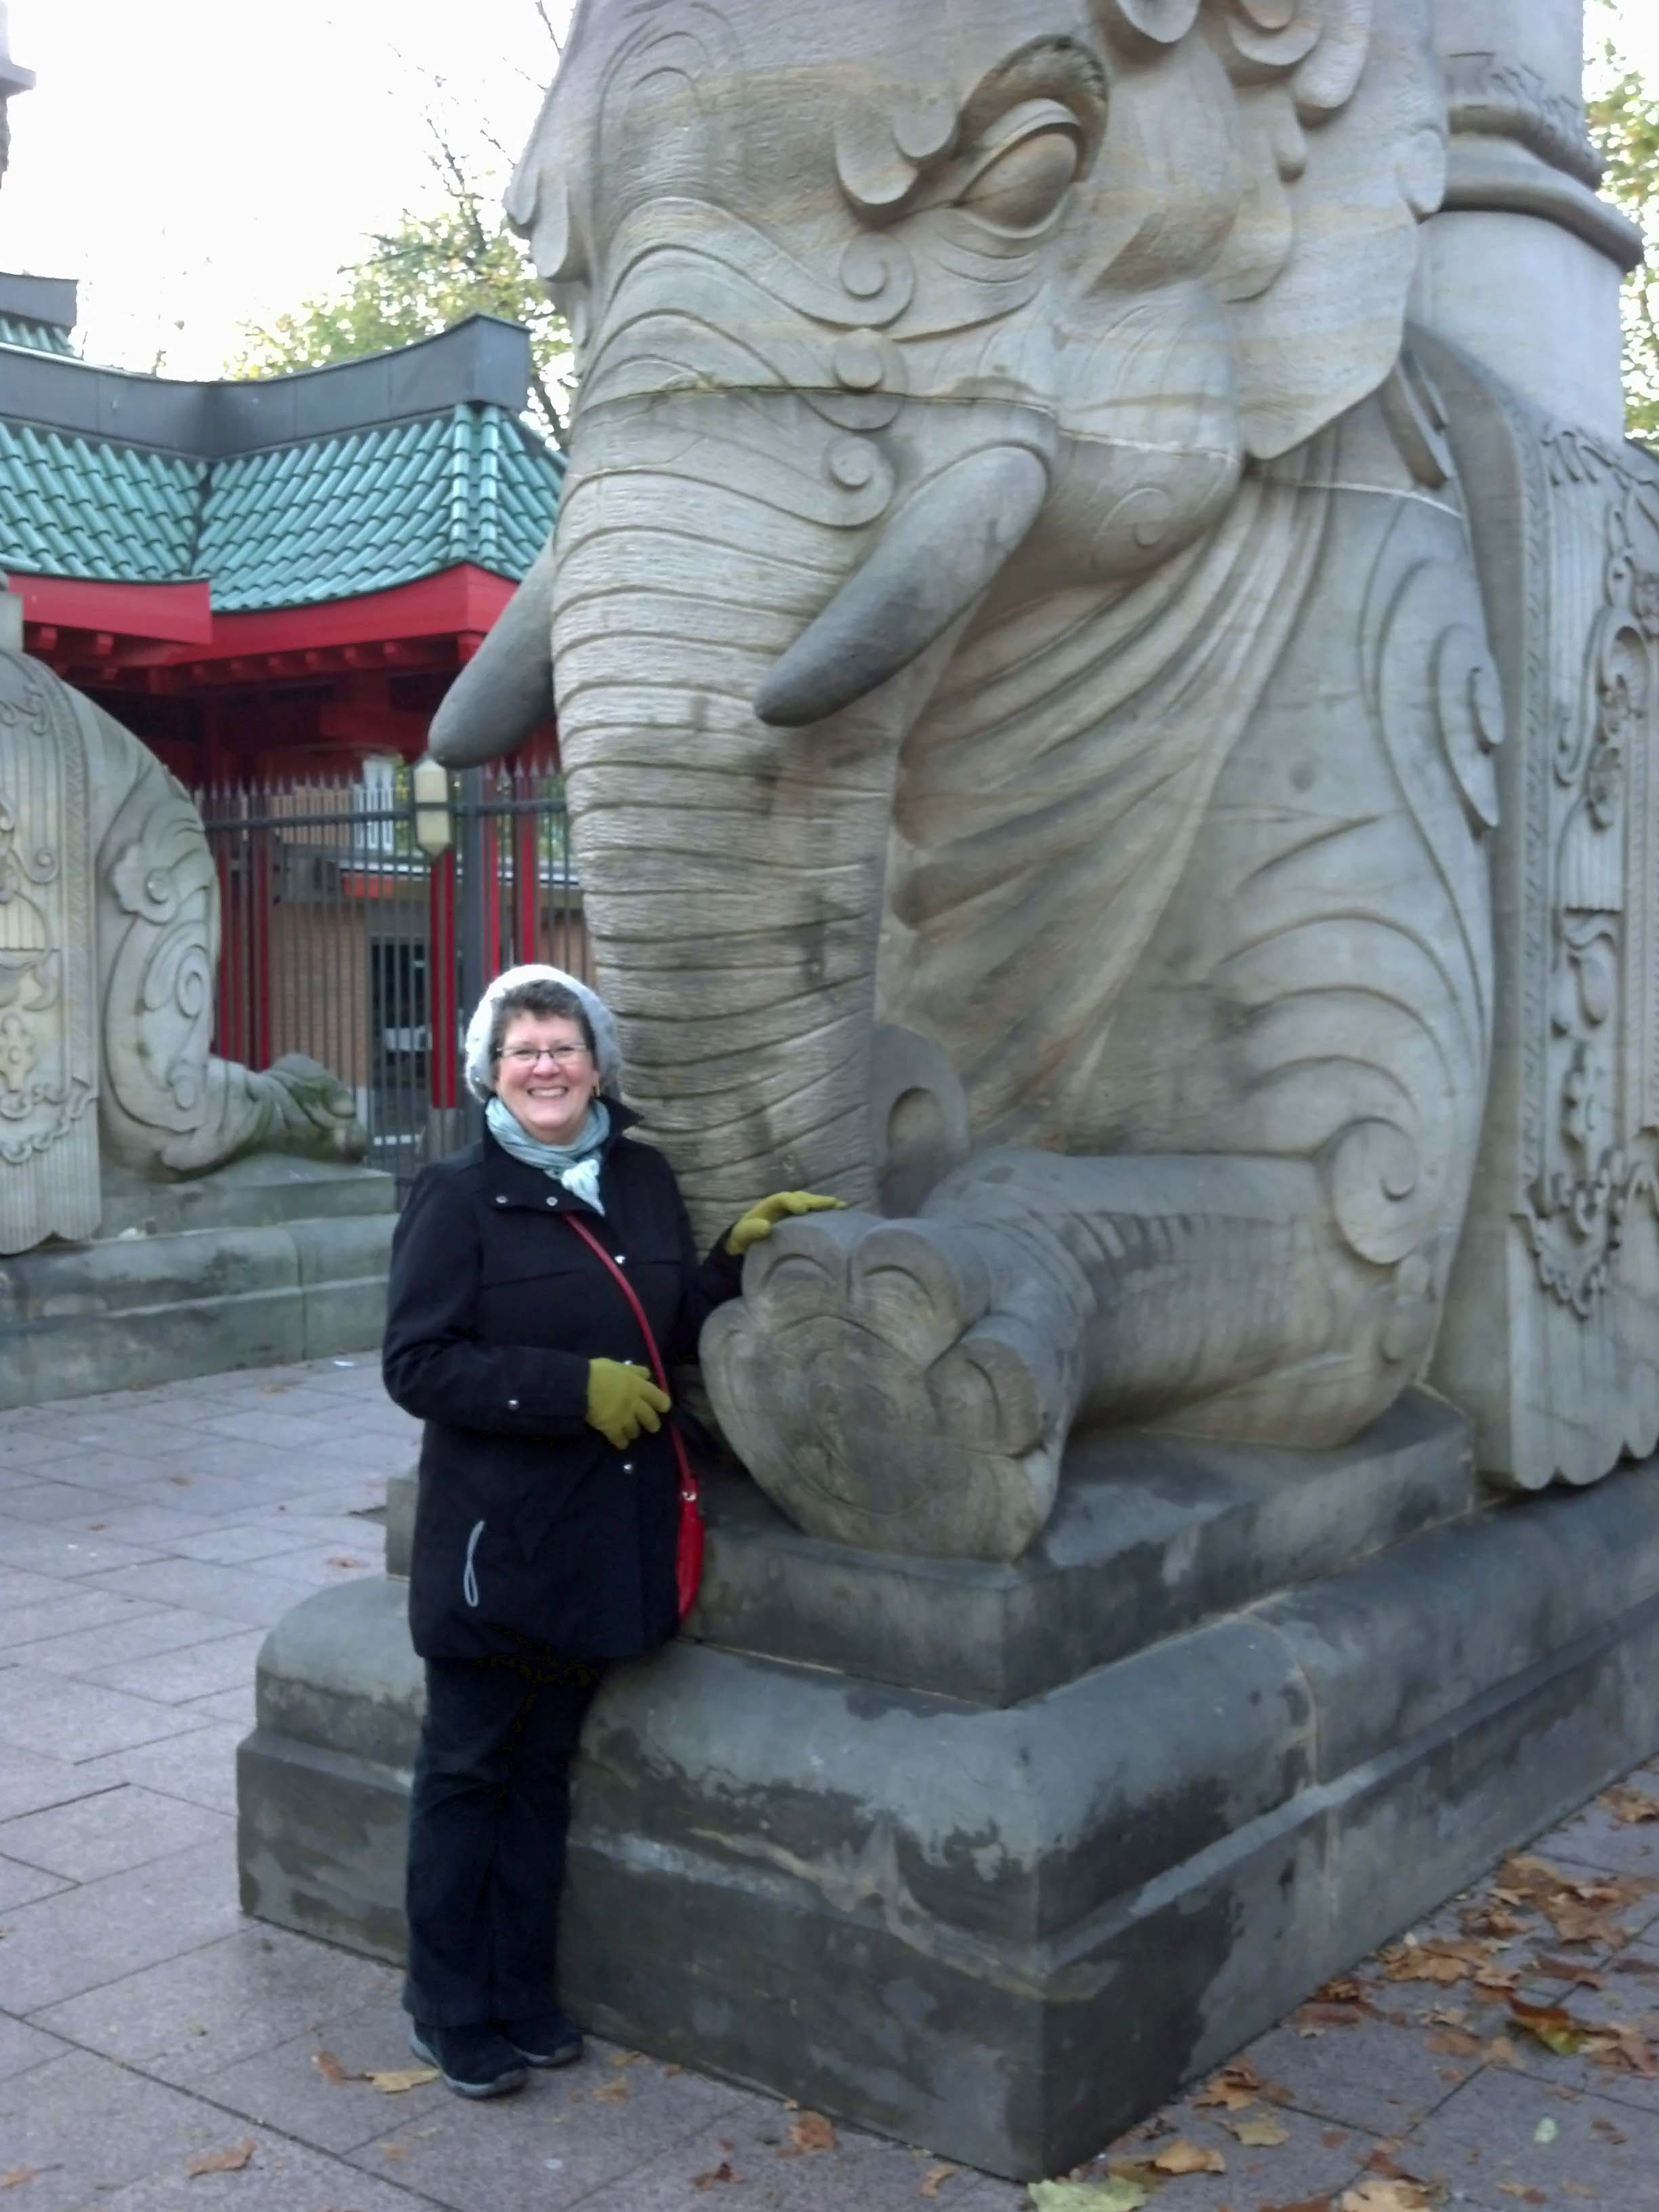 ginny and elephant